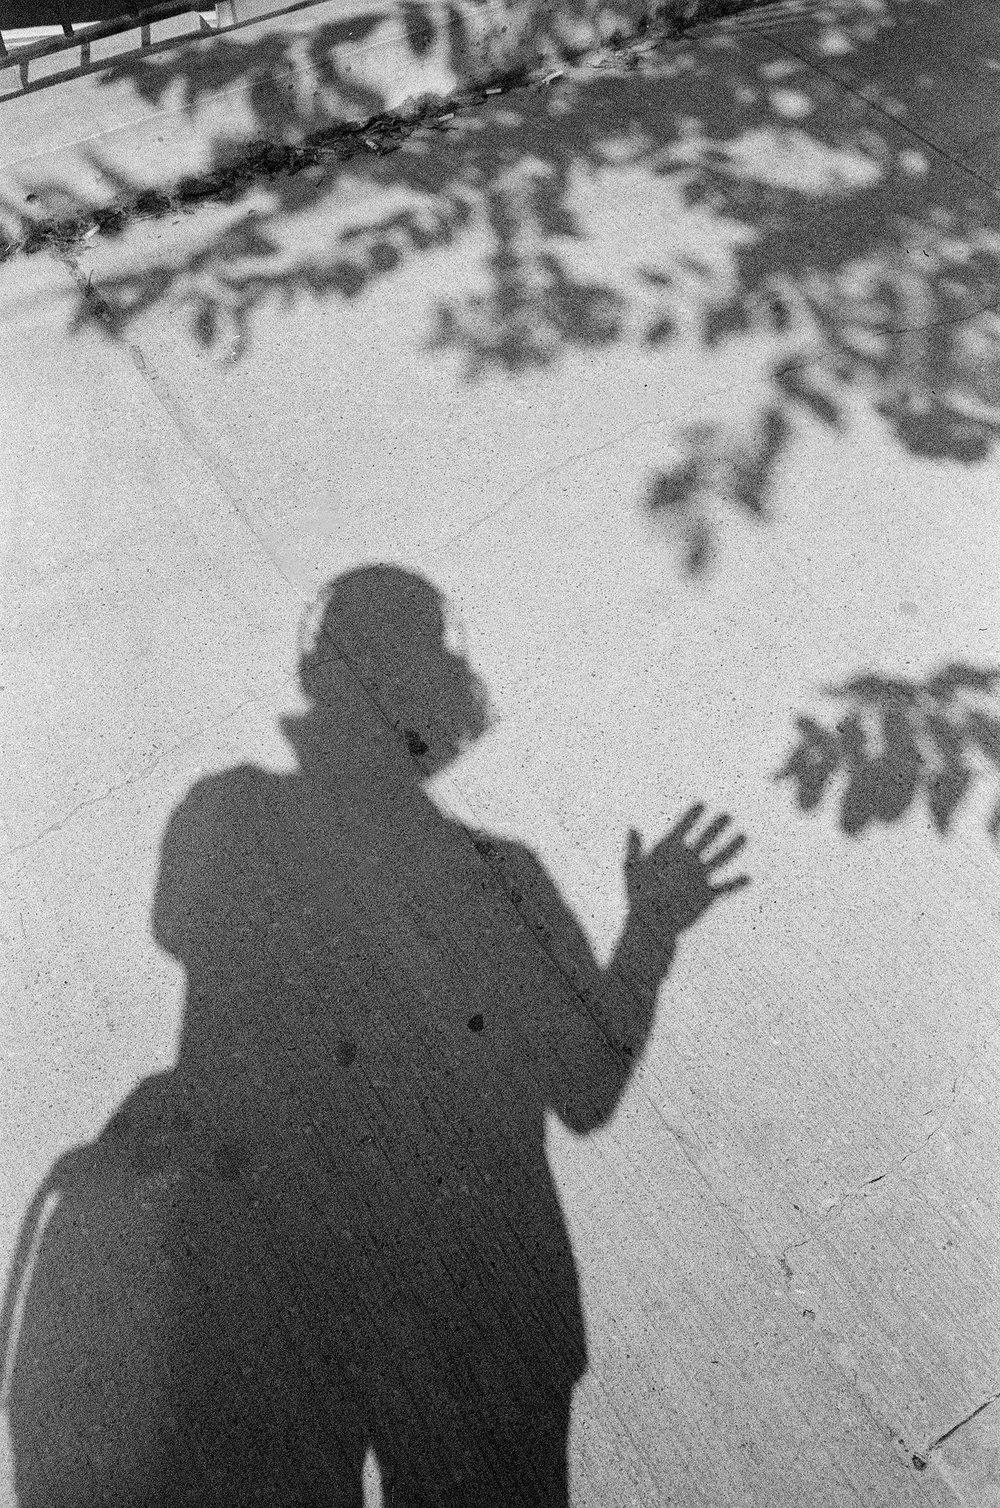 75-Self-Portrait-in-the-shadows.jpg